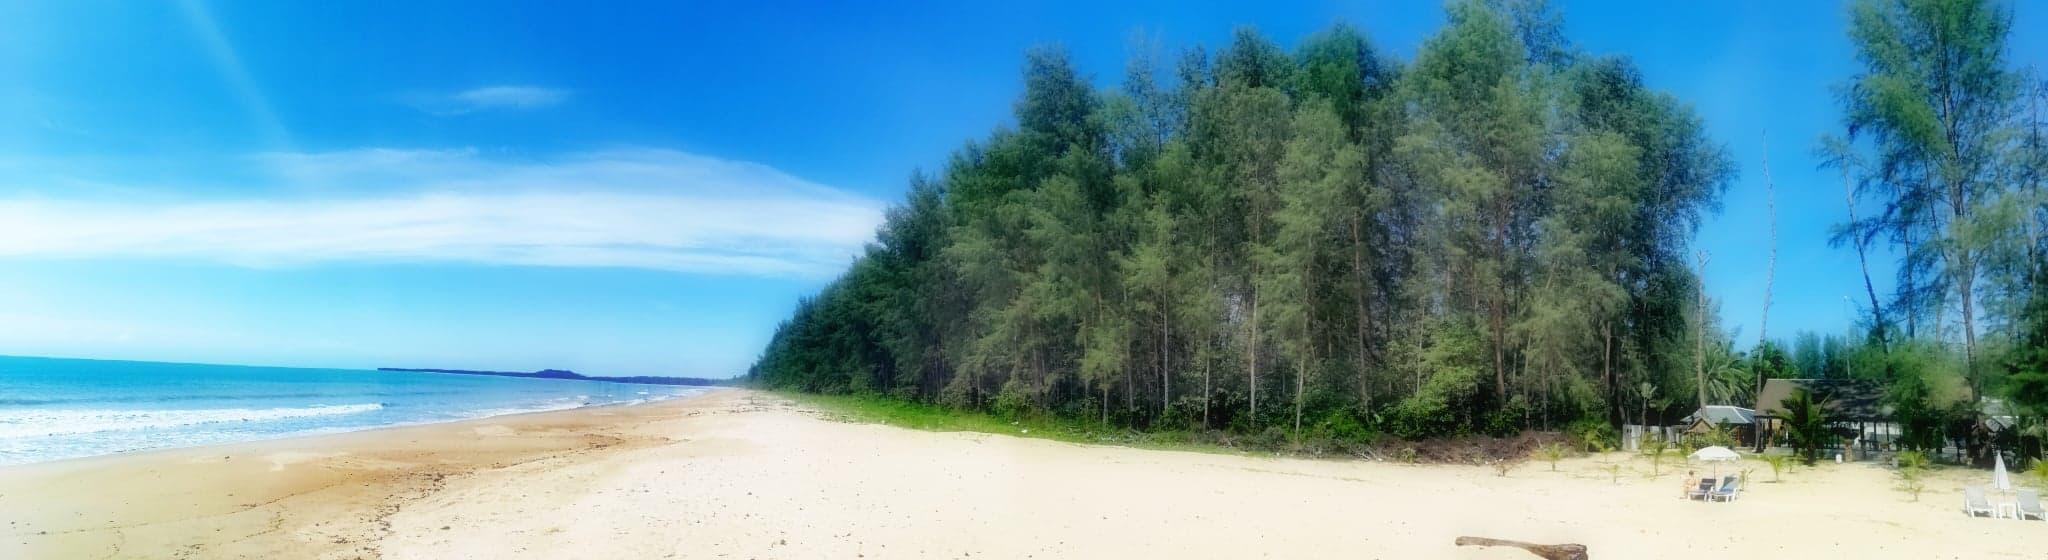 Naturist thailand